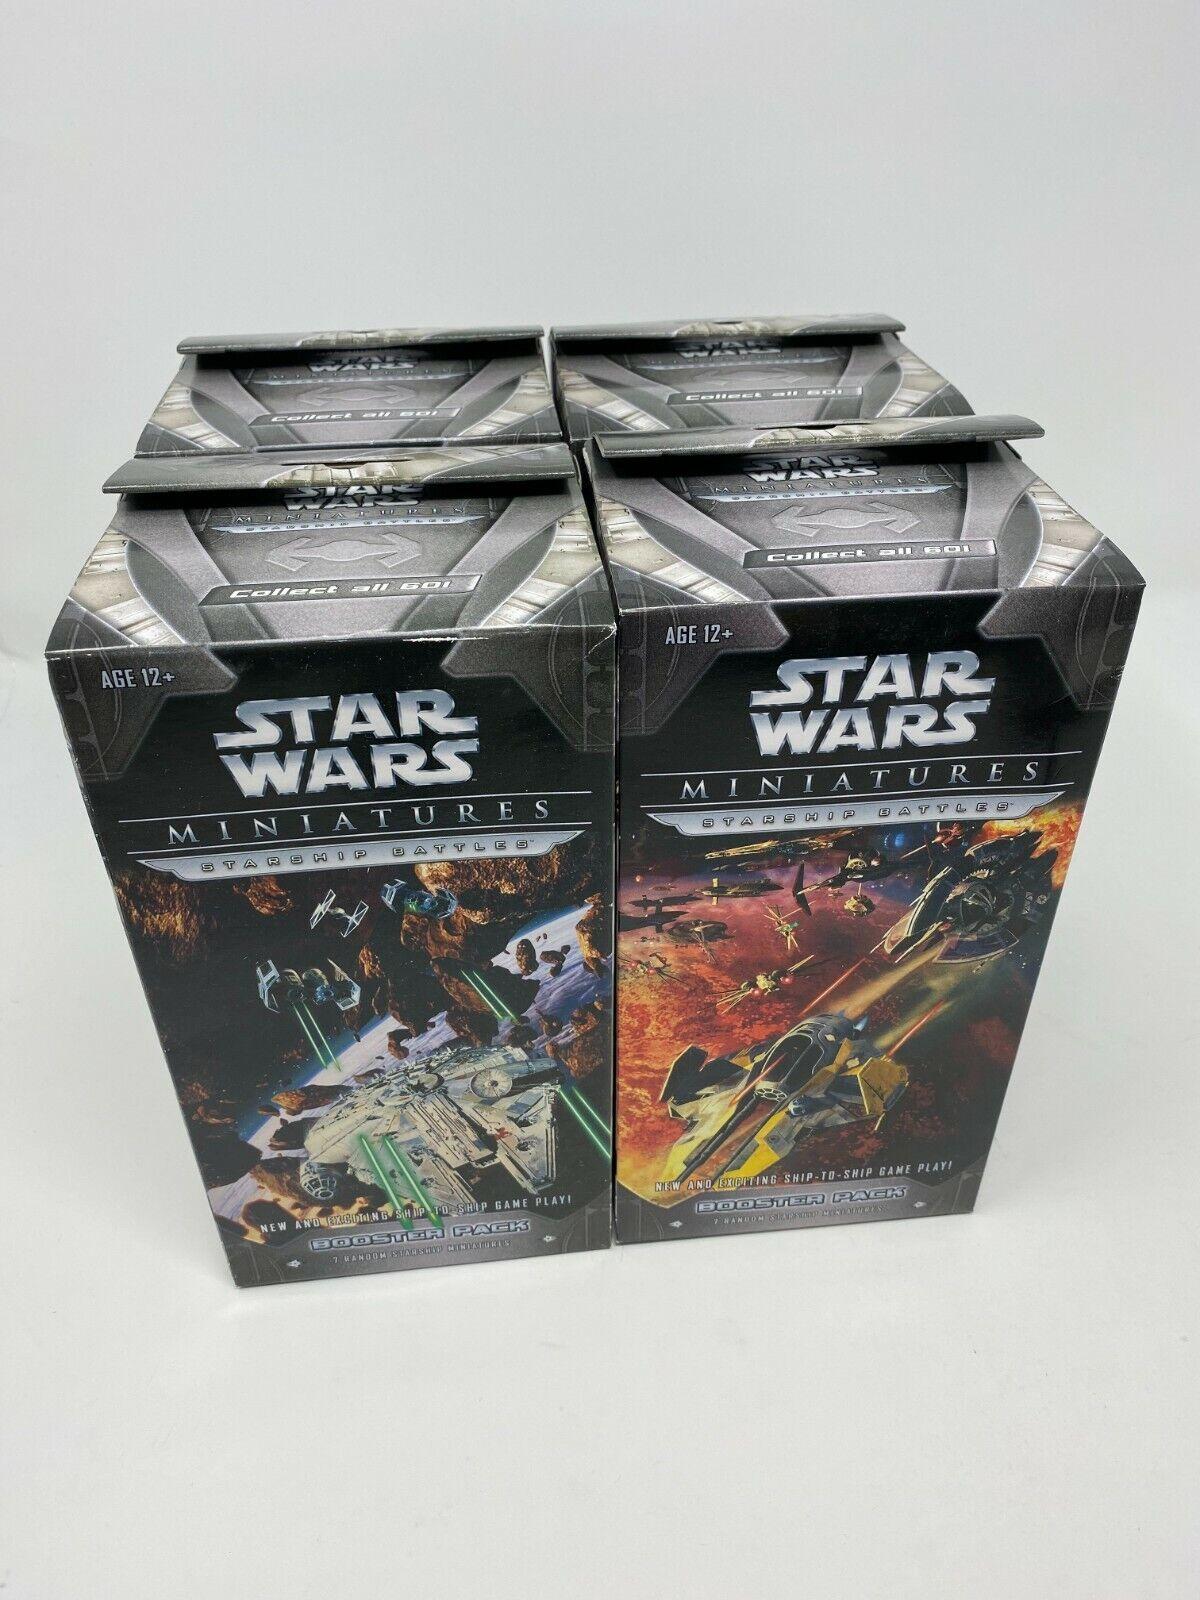 estrella guerras Miniatures estrellaship Battles Booster Pack Wizards of the Coast (x4)